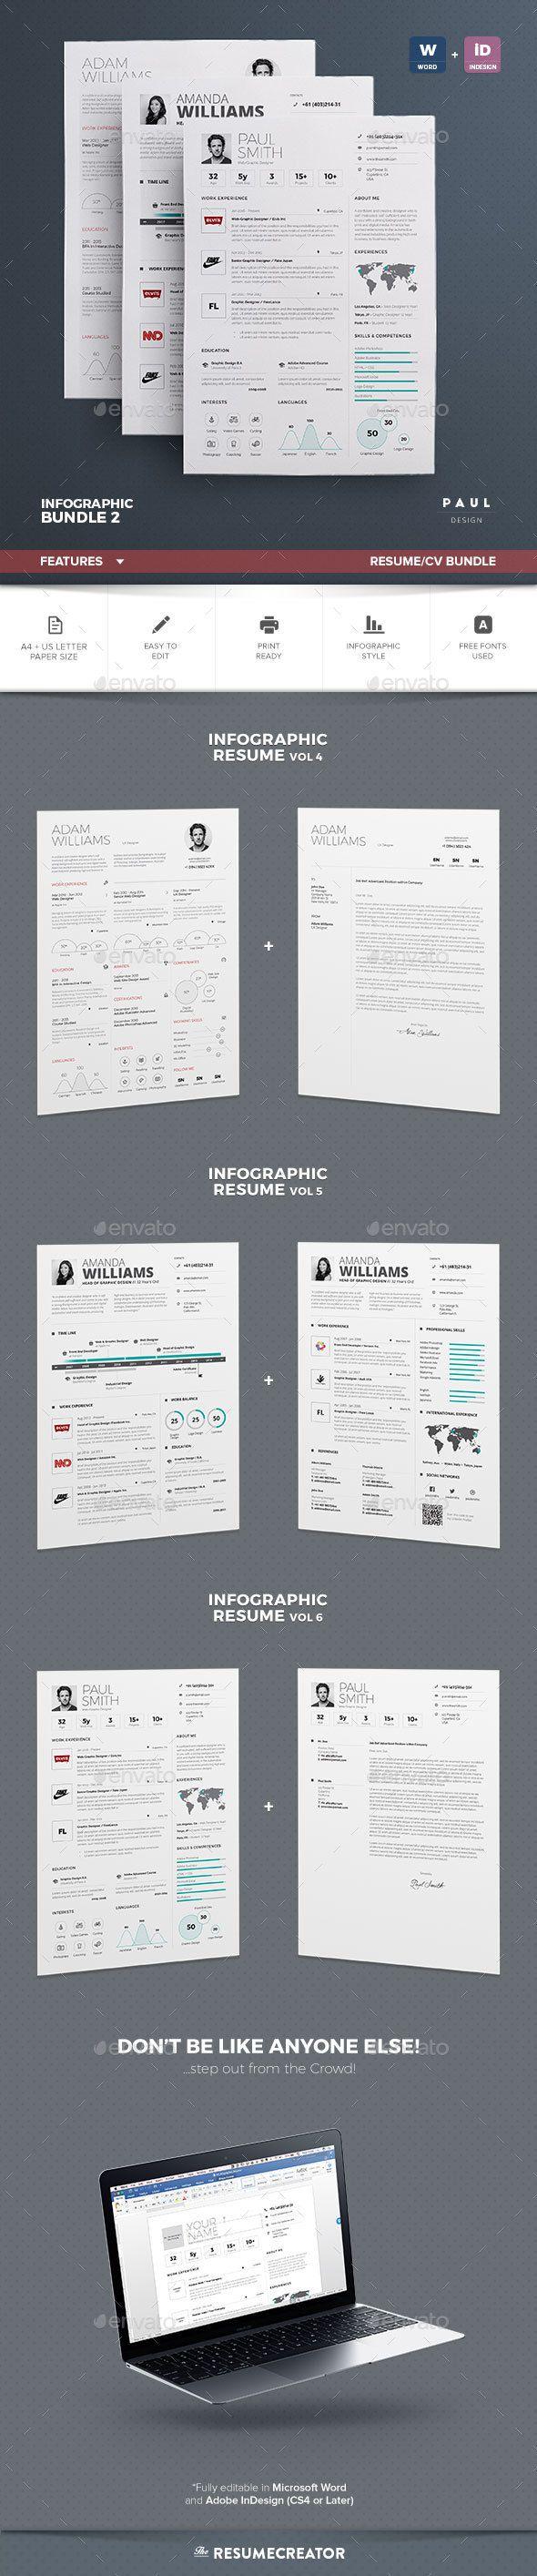 Resume Infographic Cv Bundle Vol 2